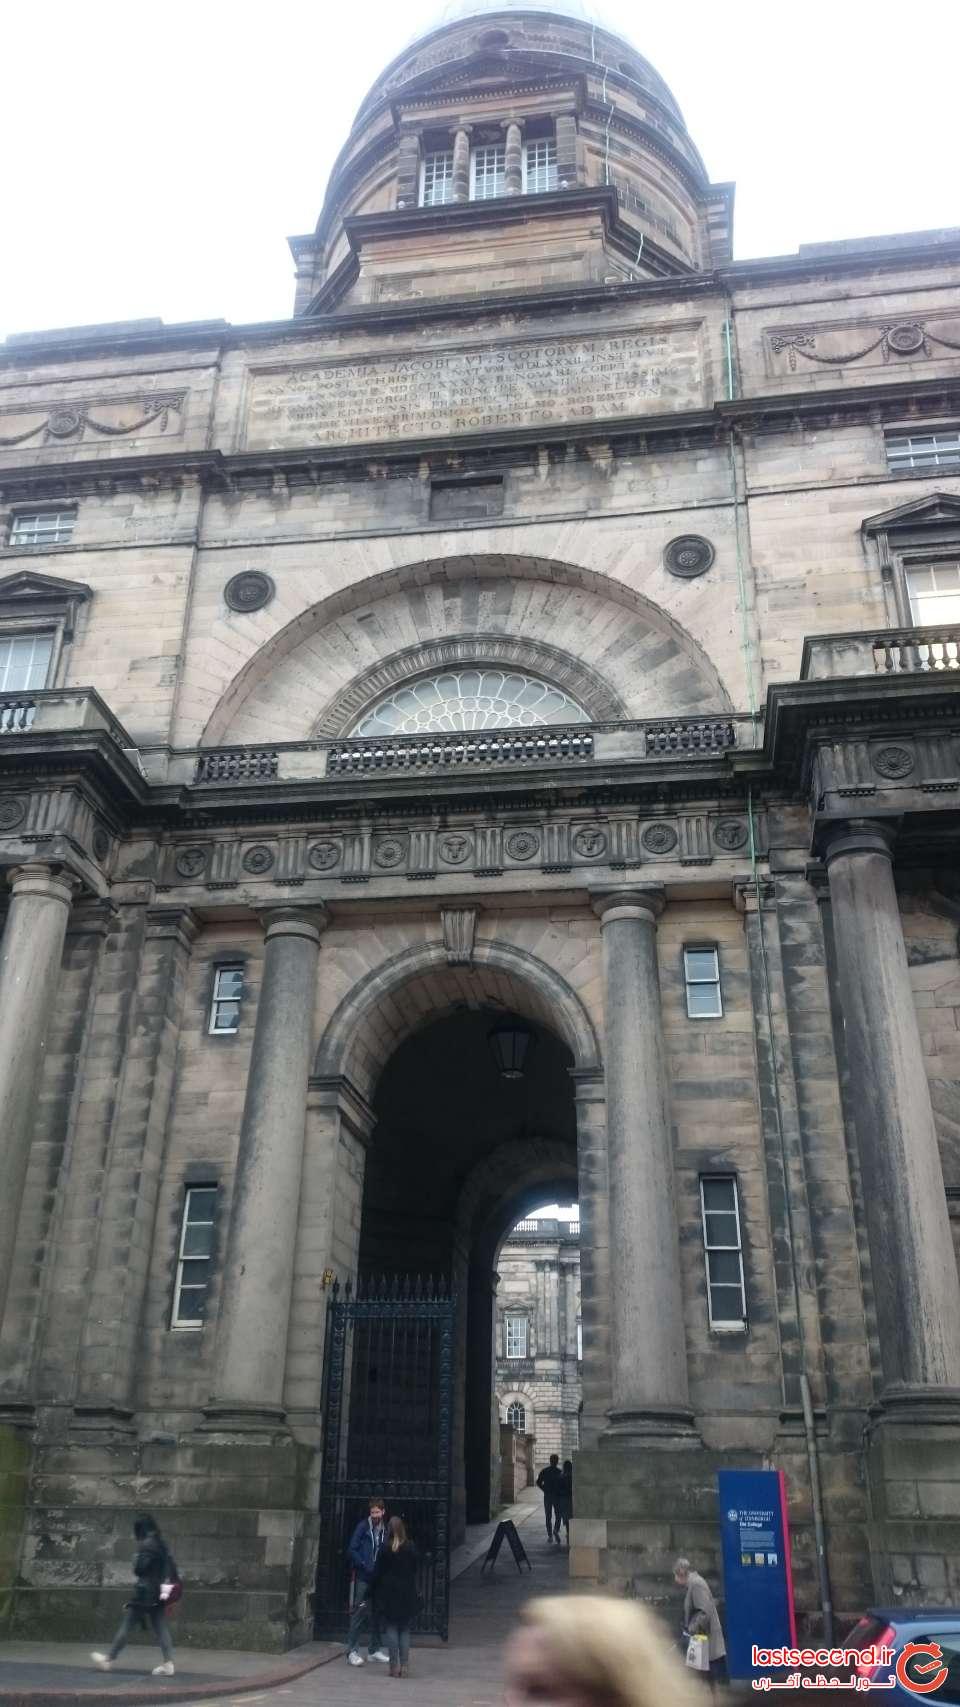 Edinburgh - سفر انگلستان 25شهریور تا 6 مهر 1396 (47).JPG